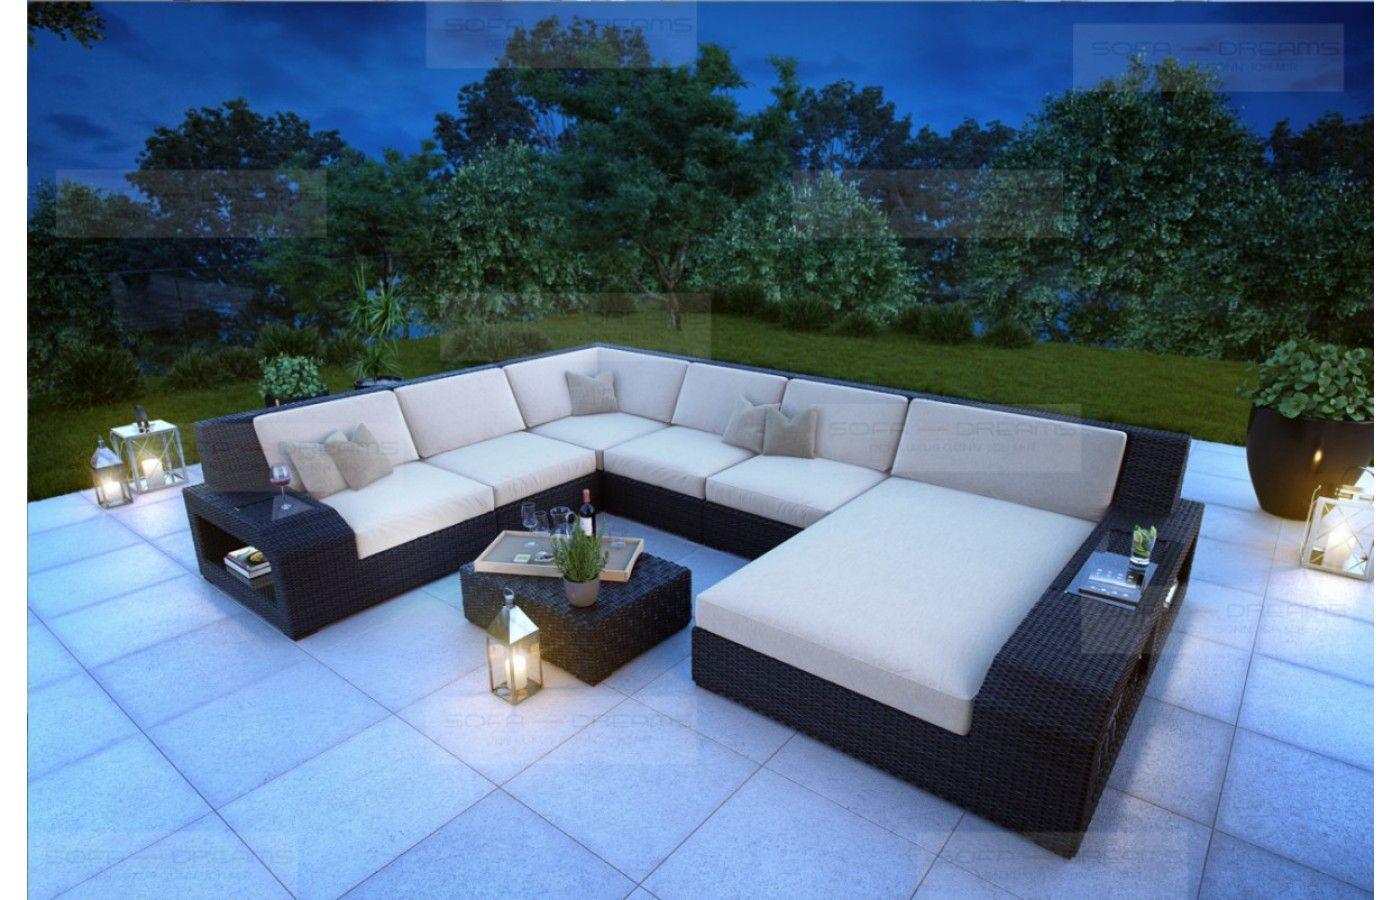 Rattan #Sofa Set MATERA mit Beleuchtung - Exklusiv bei Sofa Dreams ...